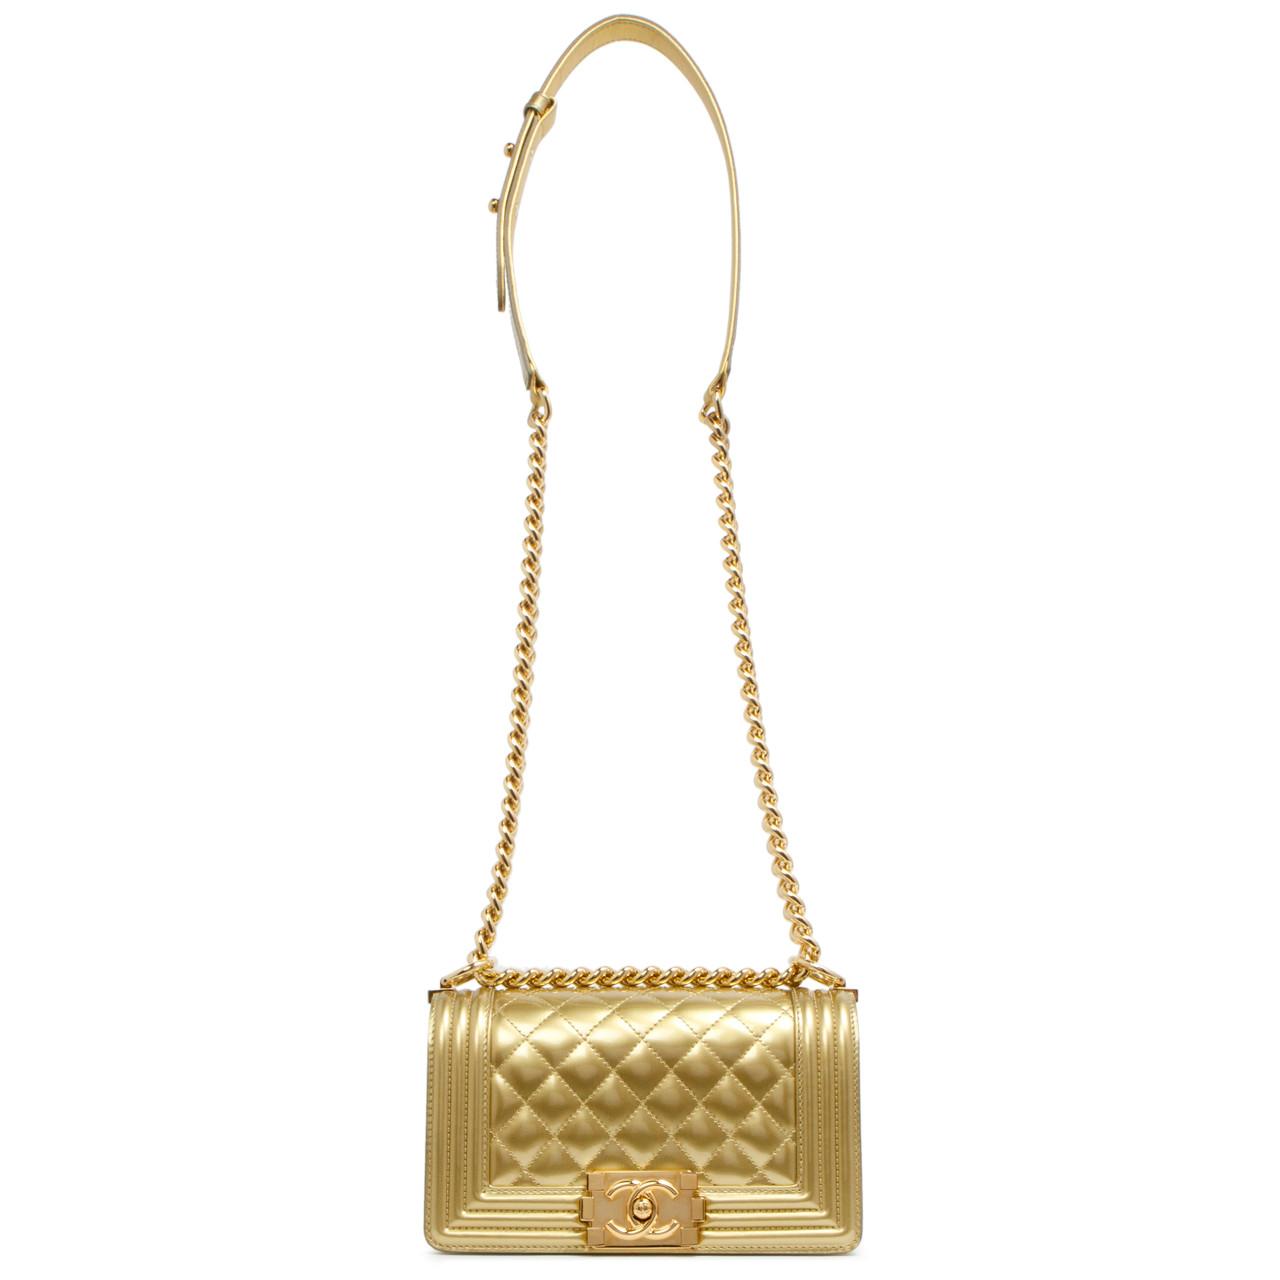 fbc18fd5e7b2 Chanel Gold Metallic Patent Small Boy Bag - modaselle